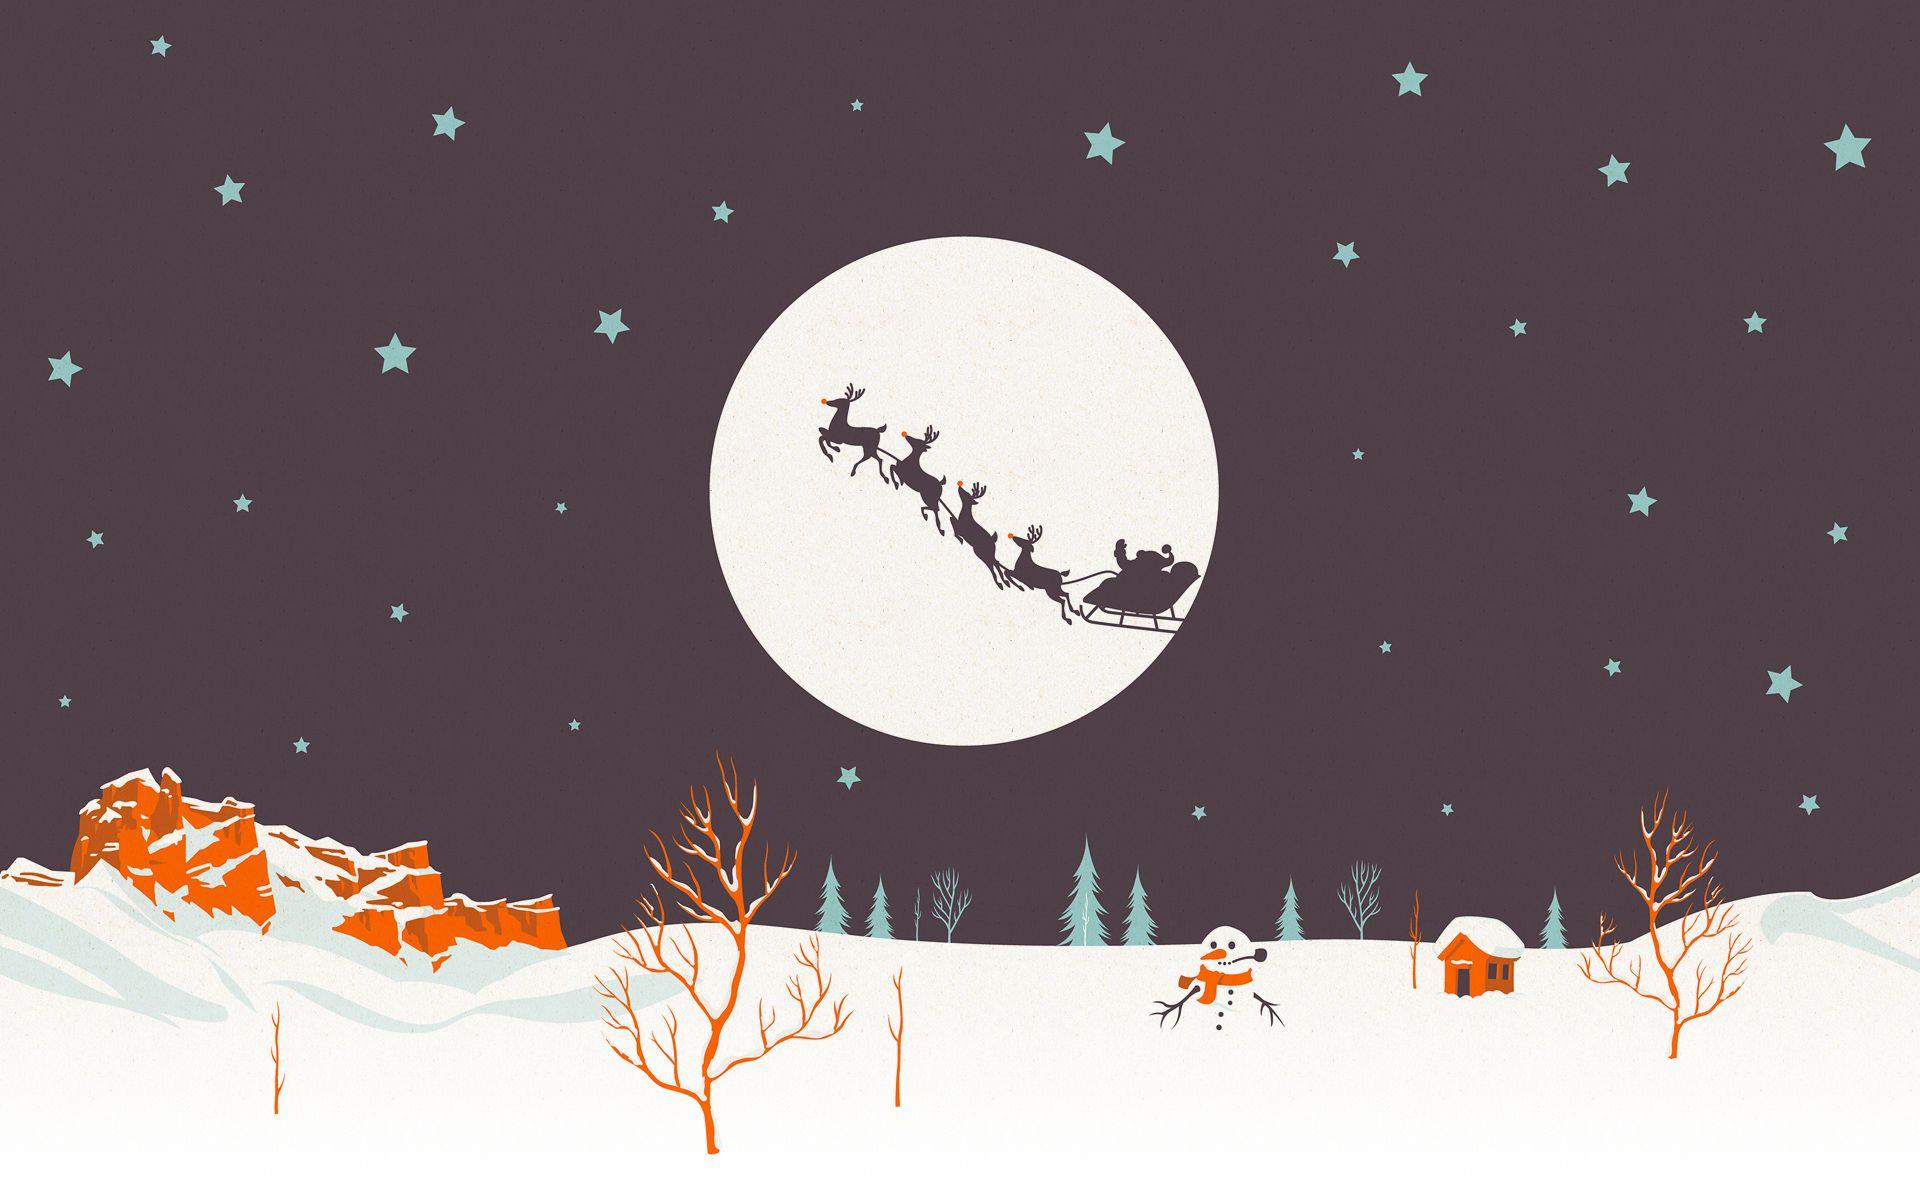 Pin By Candice Hartsough On Holly Jolly Christmas Wallpapers Tumblr Holiday Wallpaper Cute Christmas Wallpaper